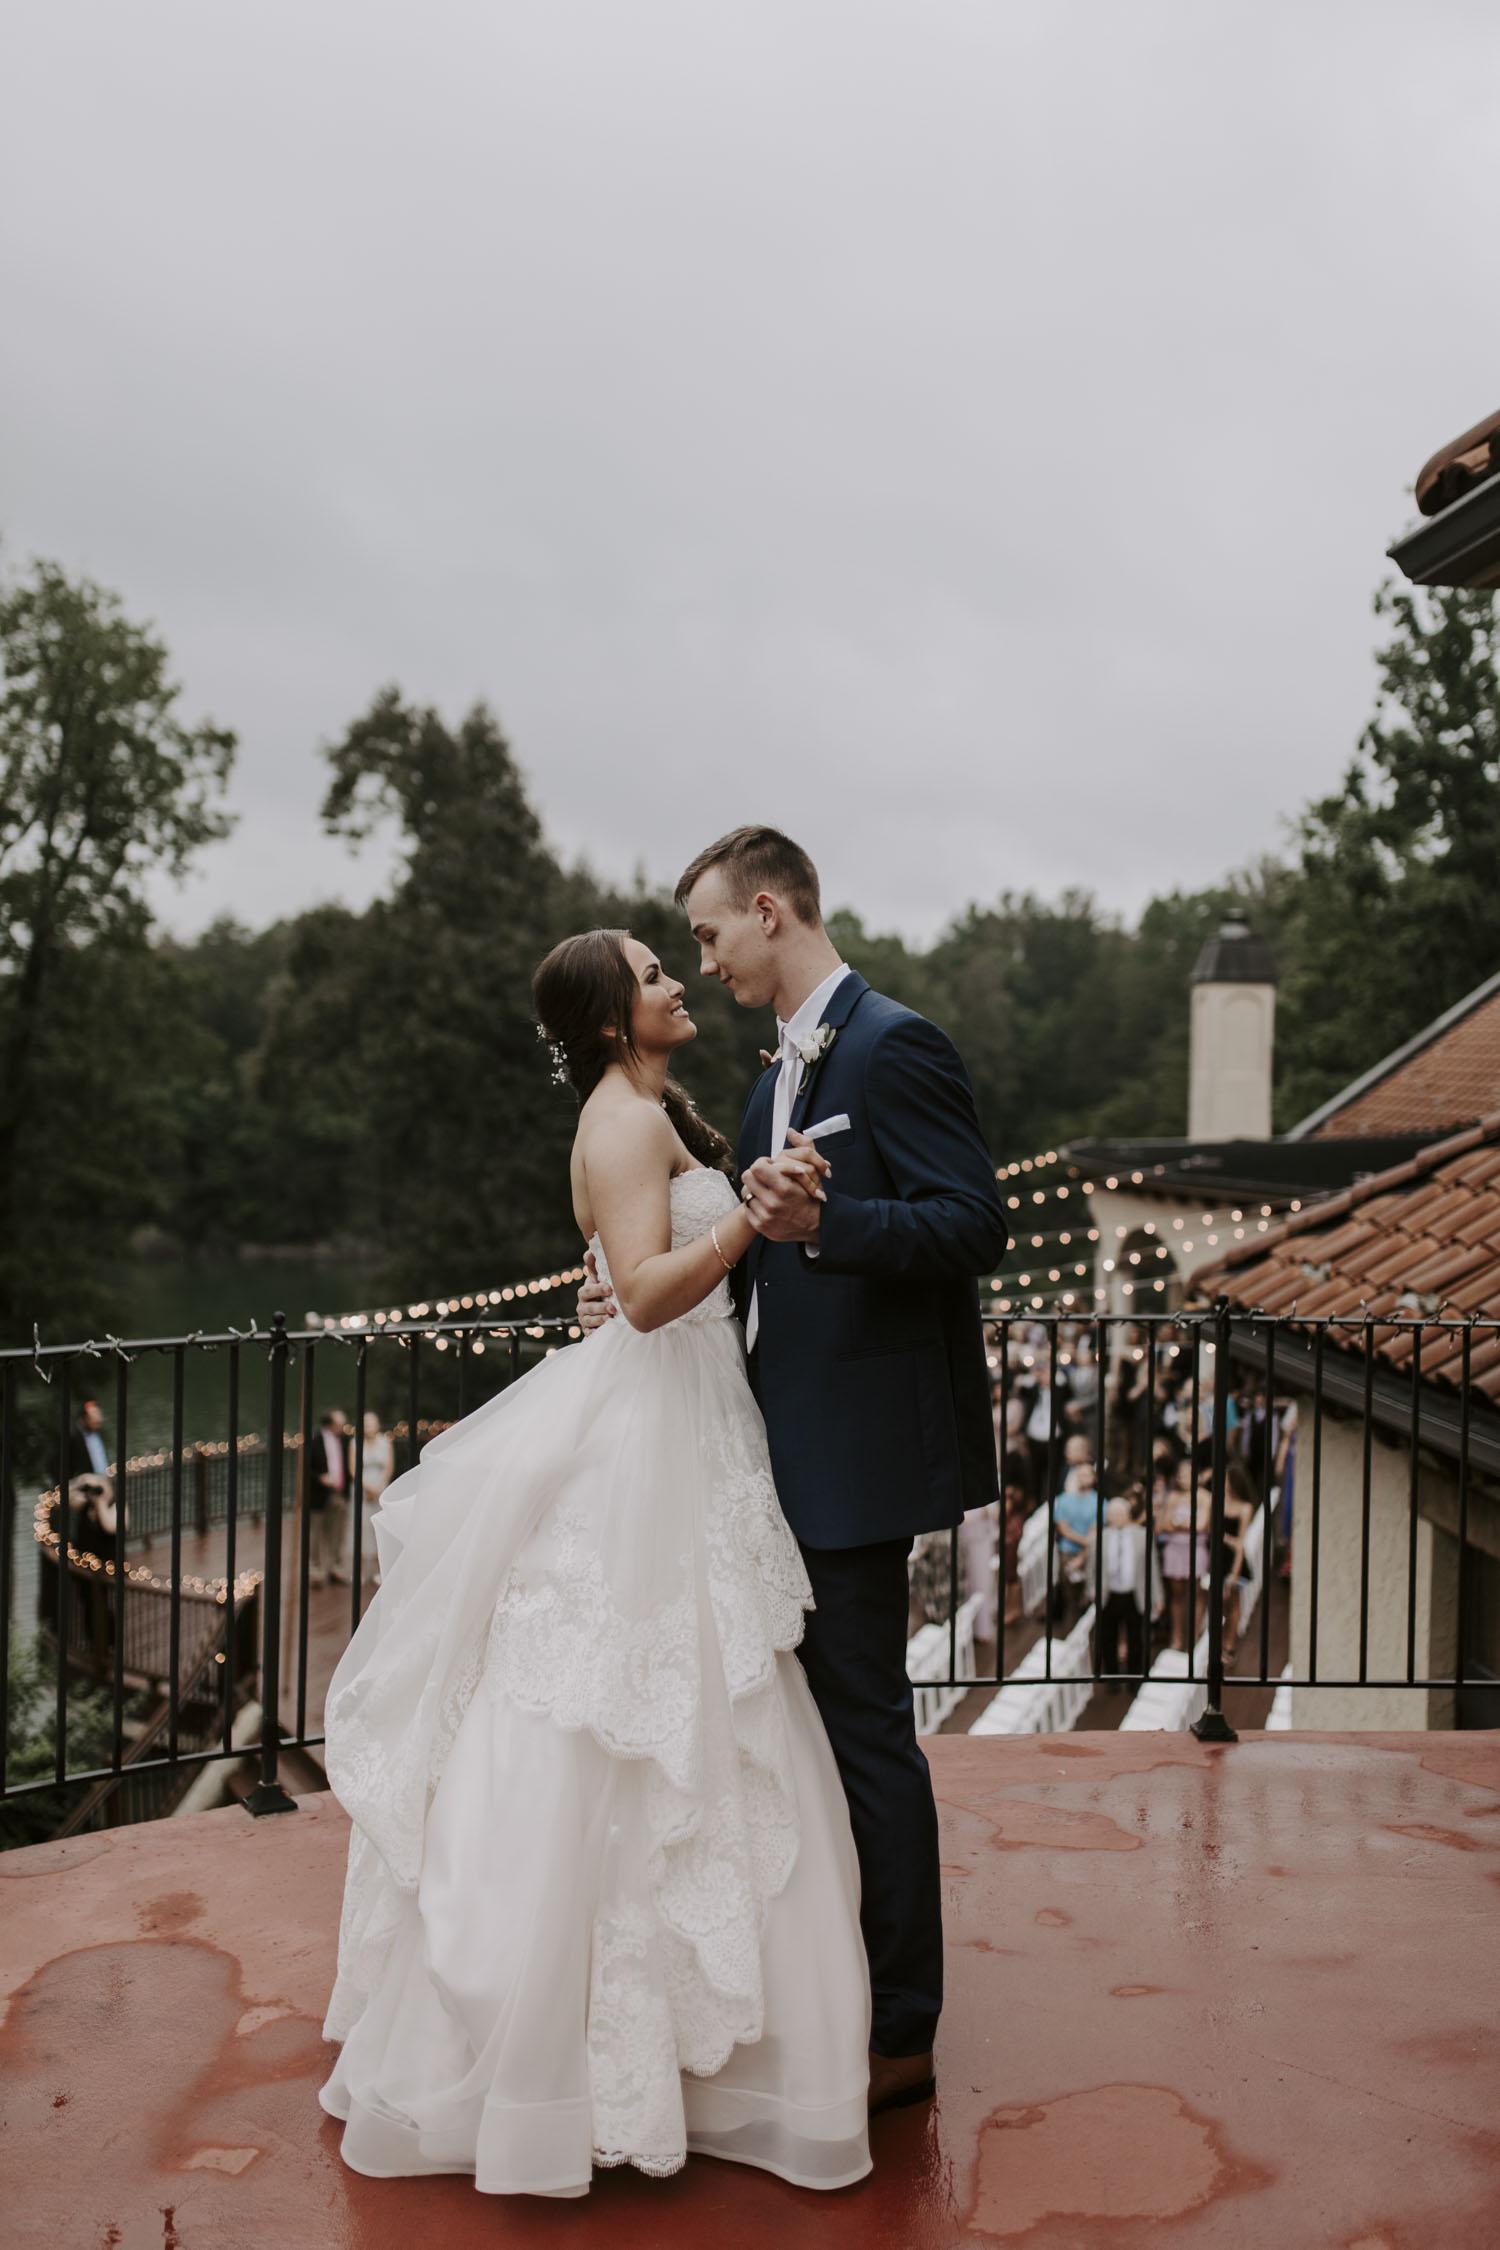 Rainy Bella Collina Wedding - First Dance at Reception | Kayli LaFon Photography, Greensboro Winston-Salem NC Wedding Photographer